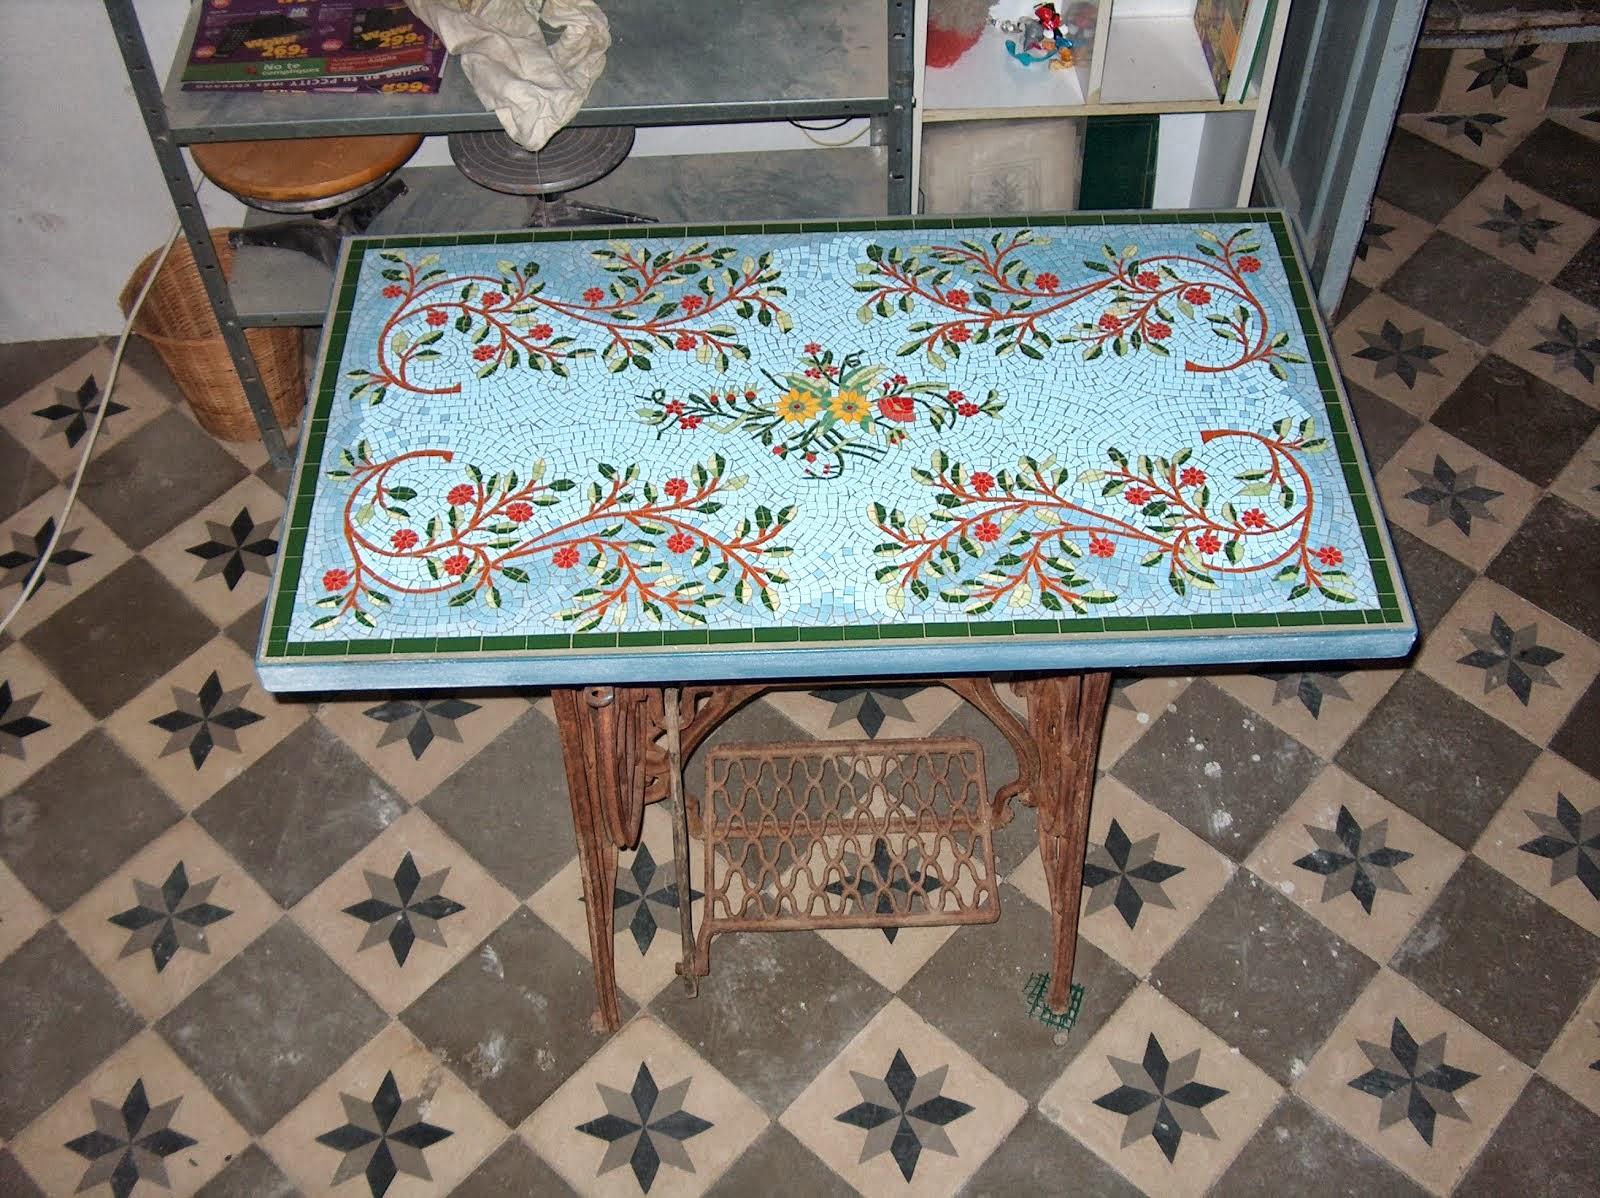 Ricardotecela mosaicos de pajaros la paloma parte - Mesas mosaico segunda mano ...